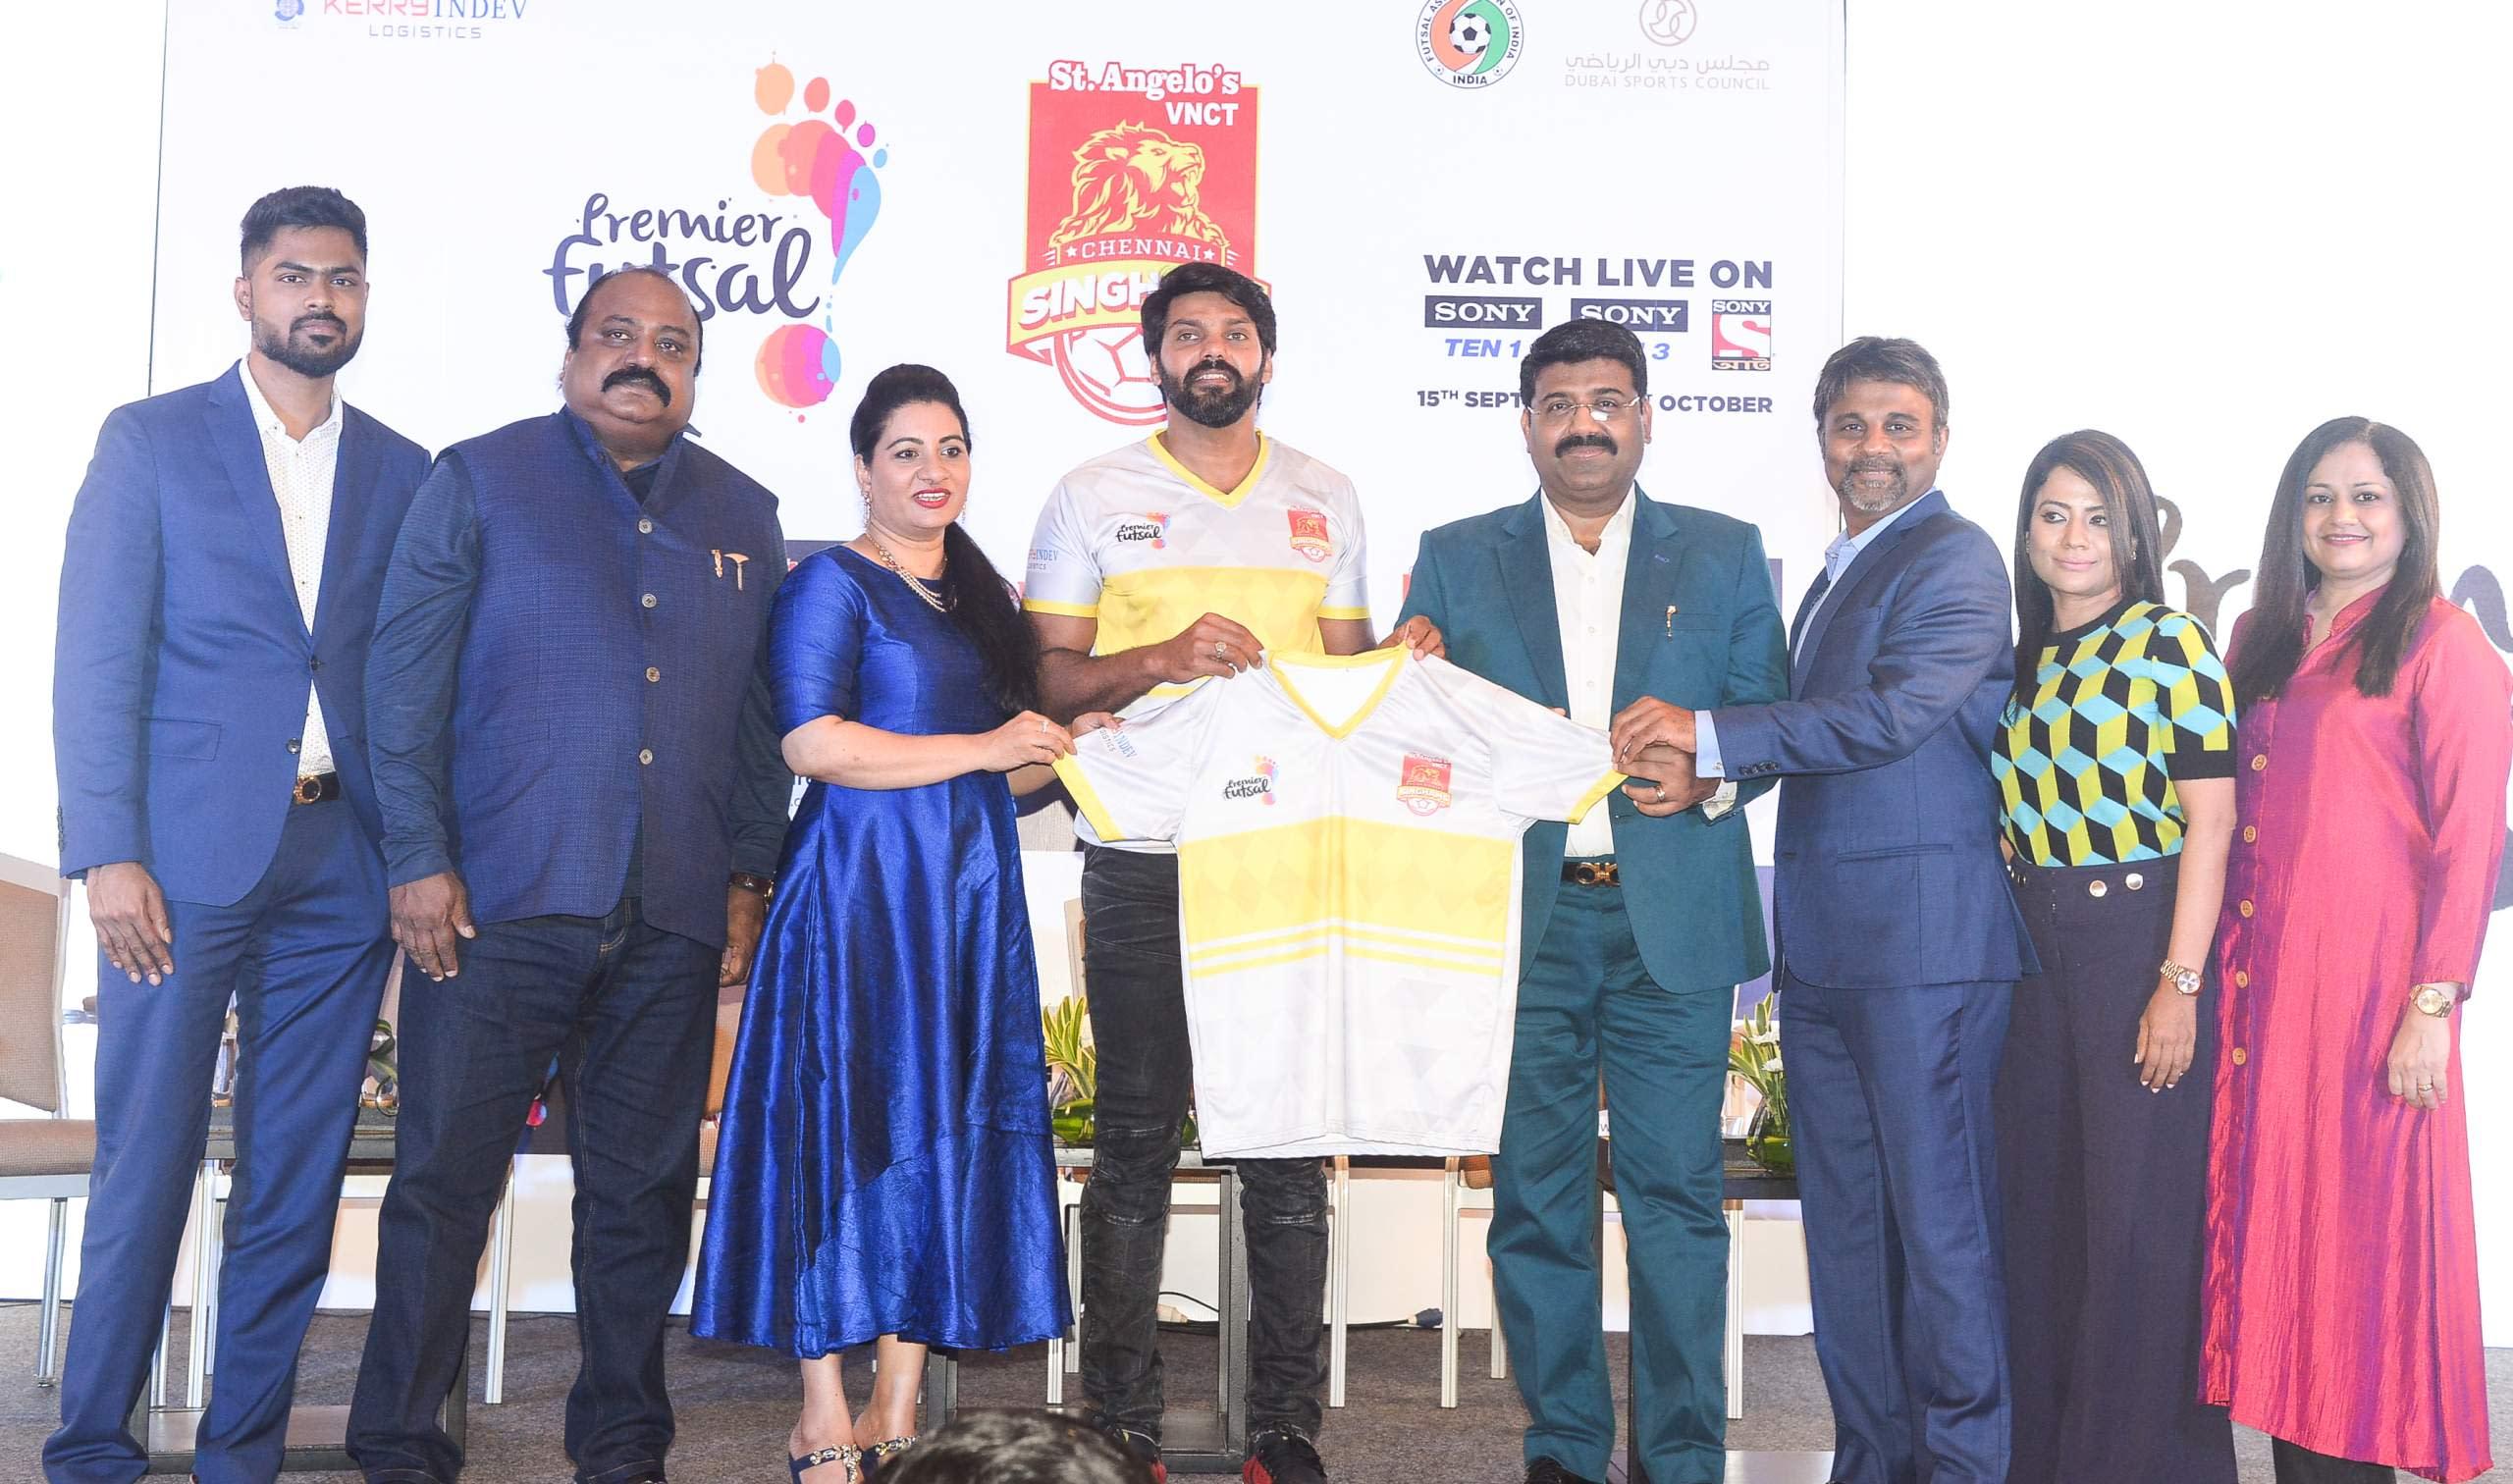 Premier Futsal Season 2: Two new owners for Chennai